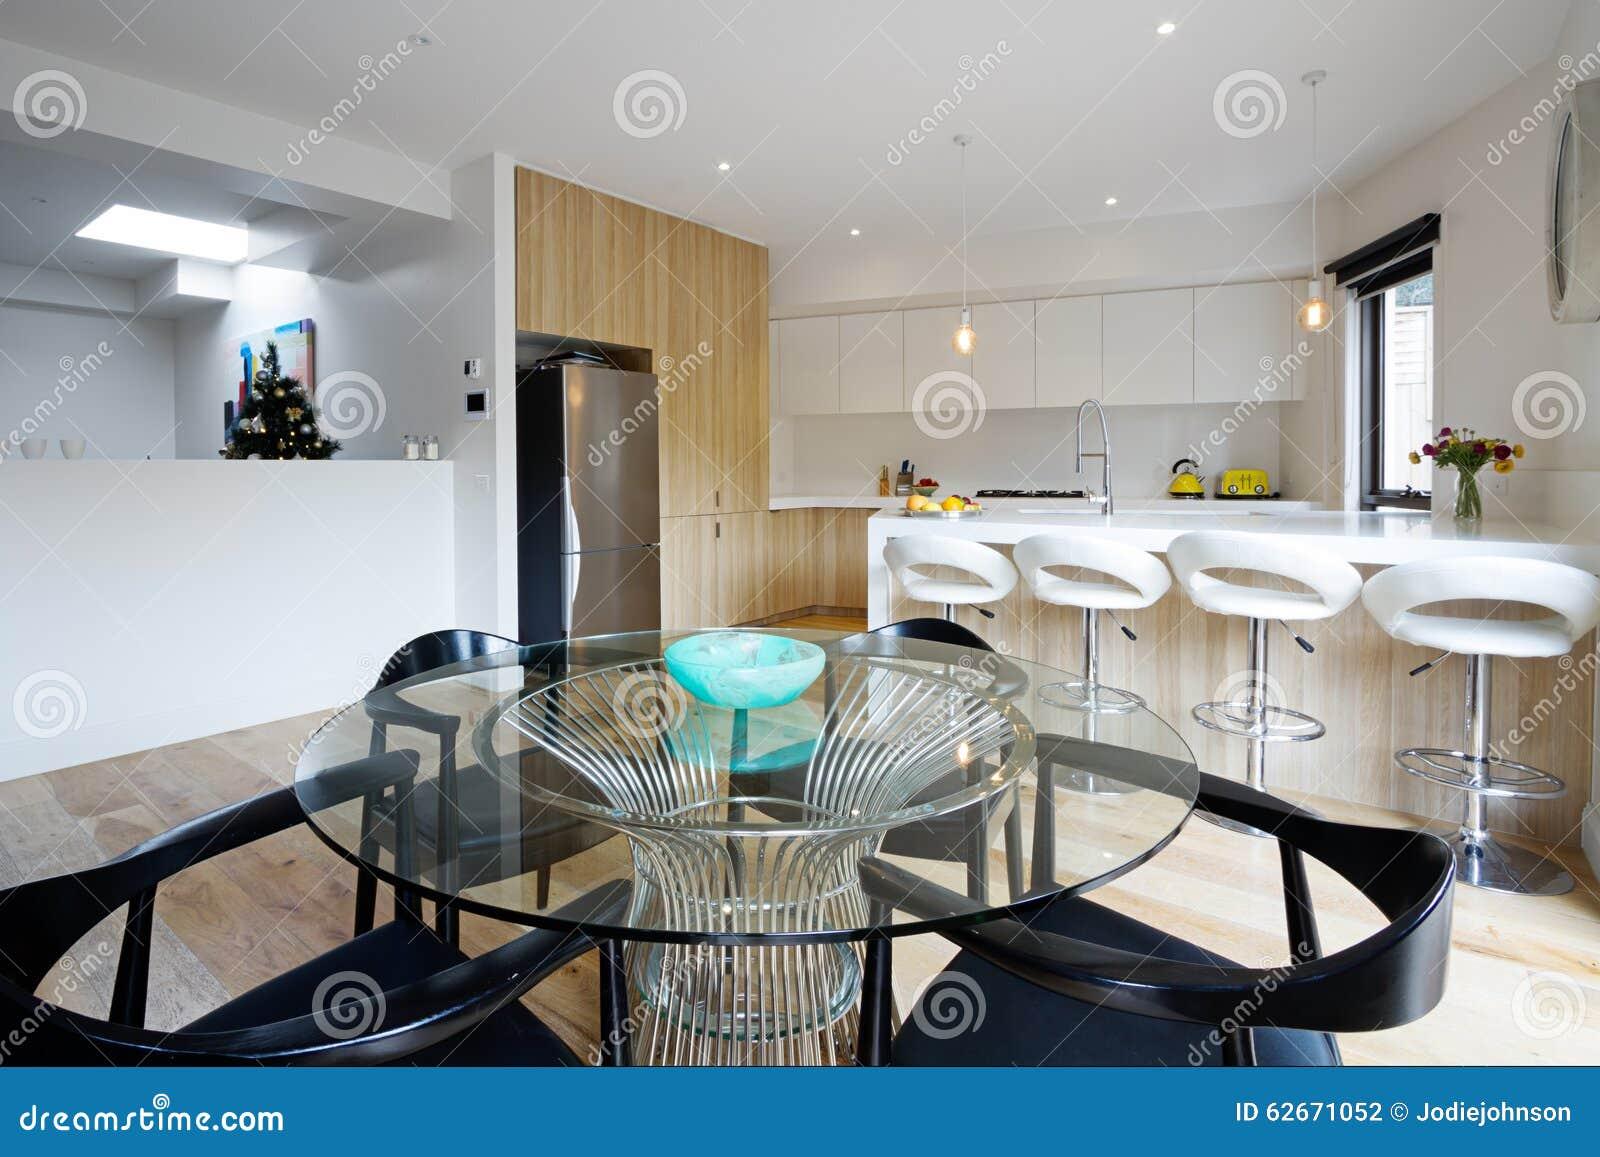 Cuisine avec salle a manger intgre cuisine by carlos for Plan cuisine ouverte salle manger